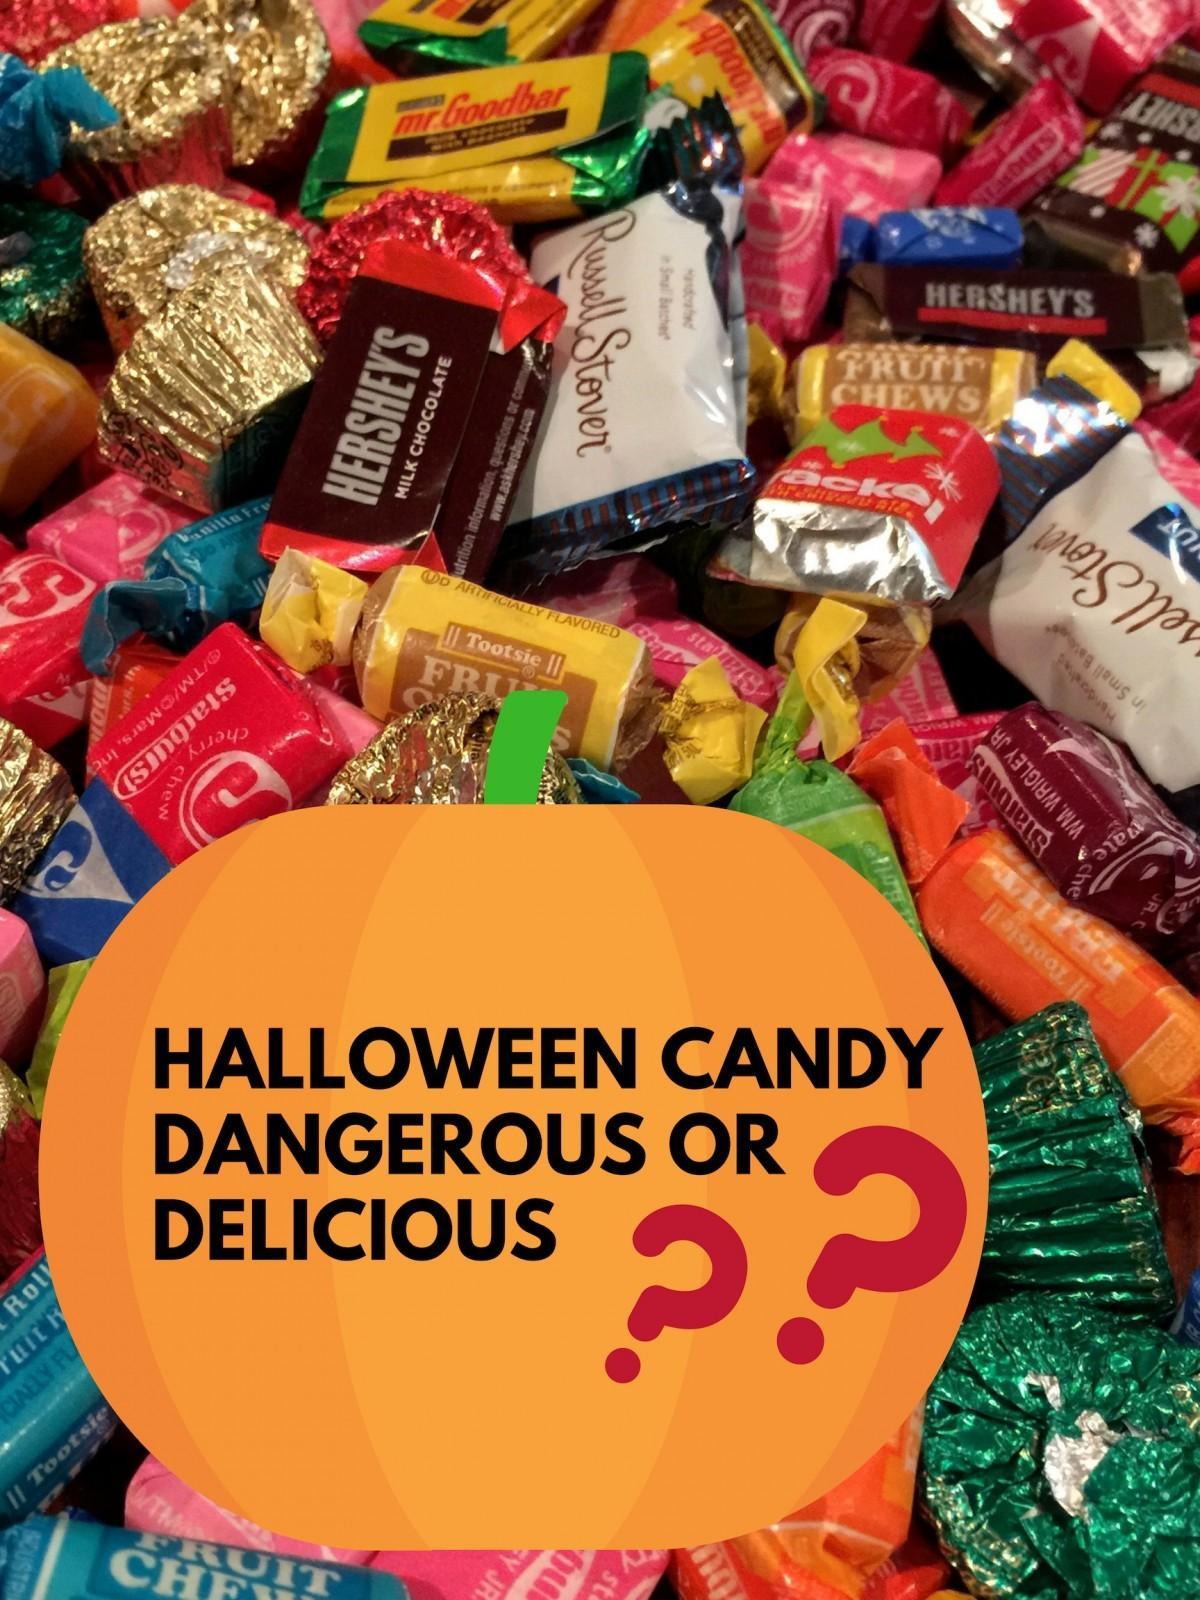 Wesleyan unwraps killer candy myth